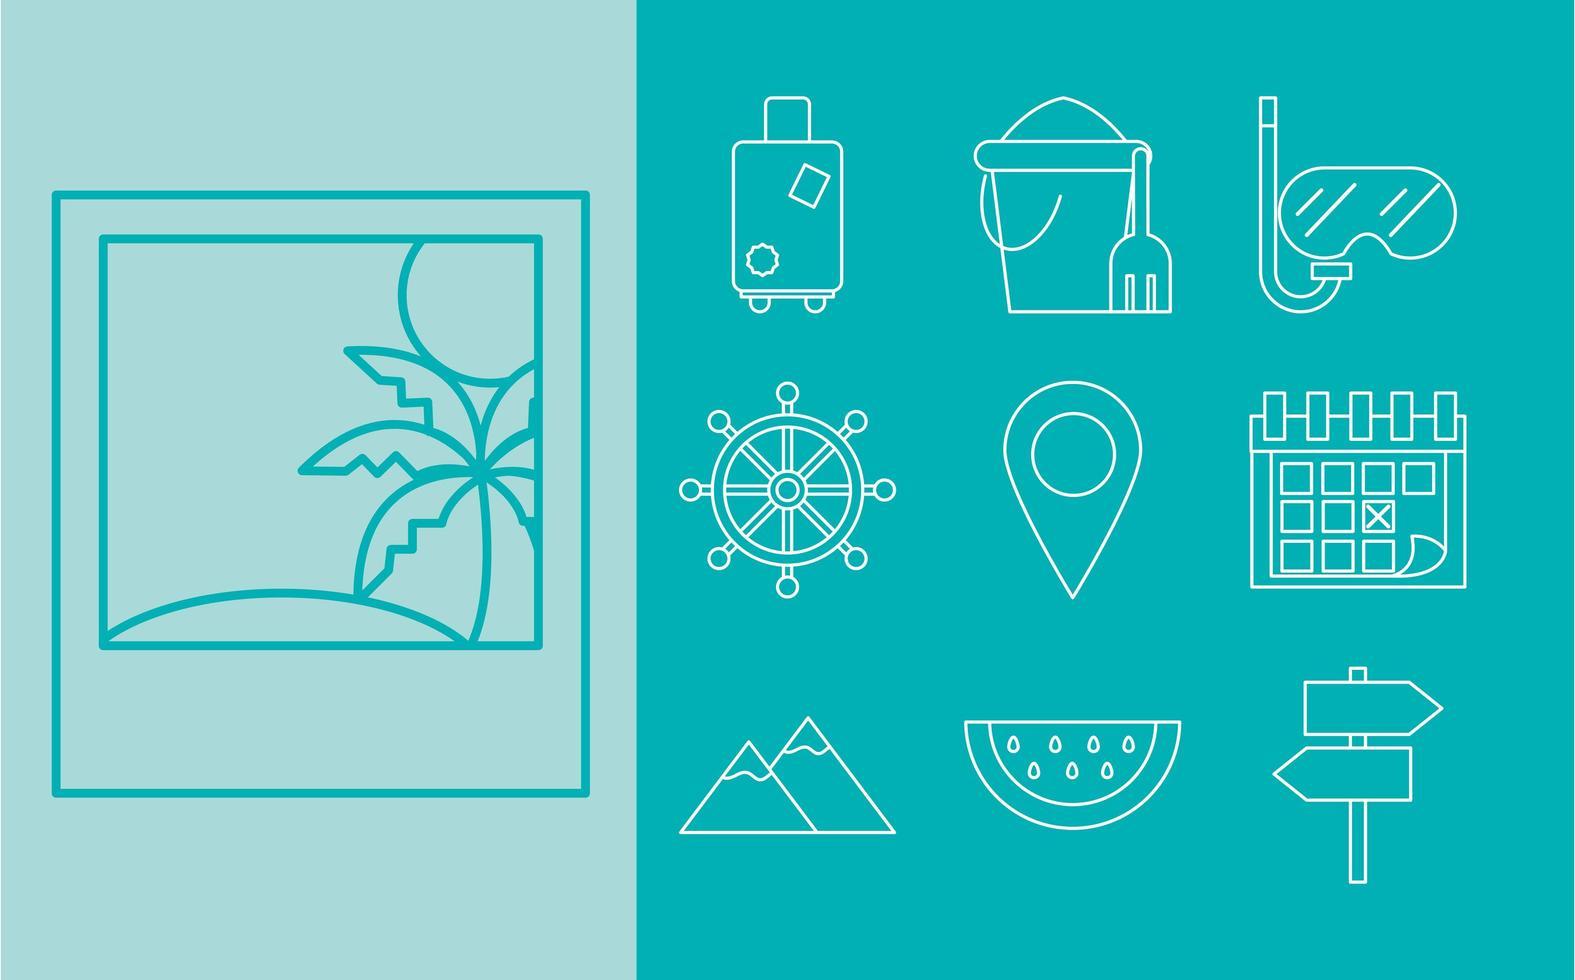 reizen en toerisme pictogramserie vector